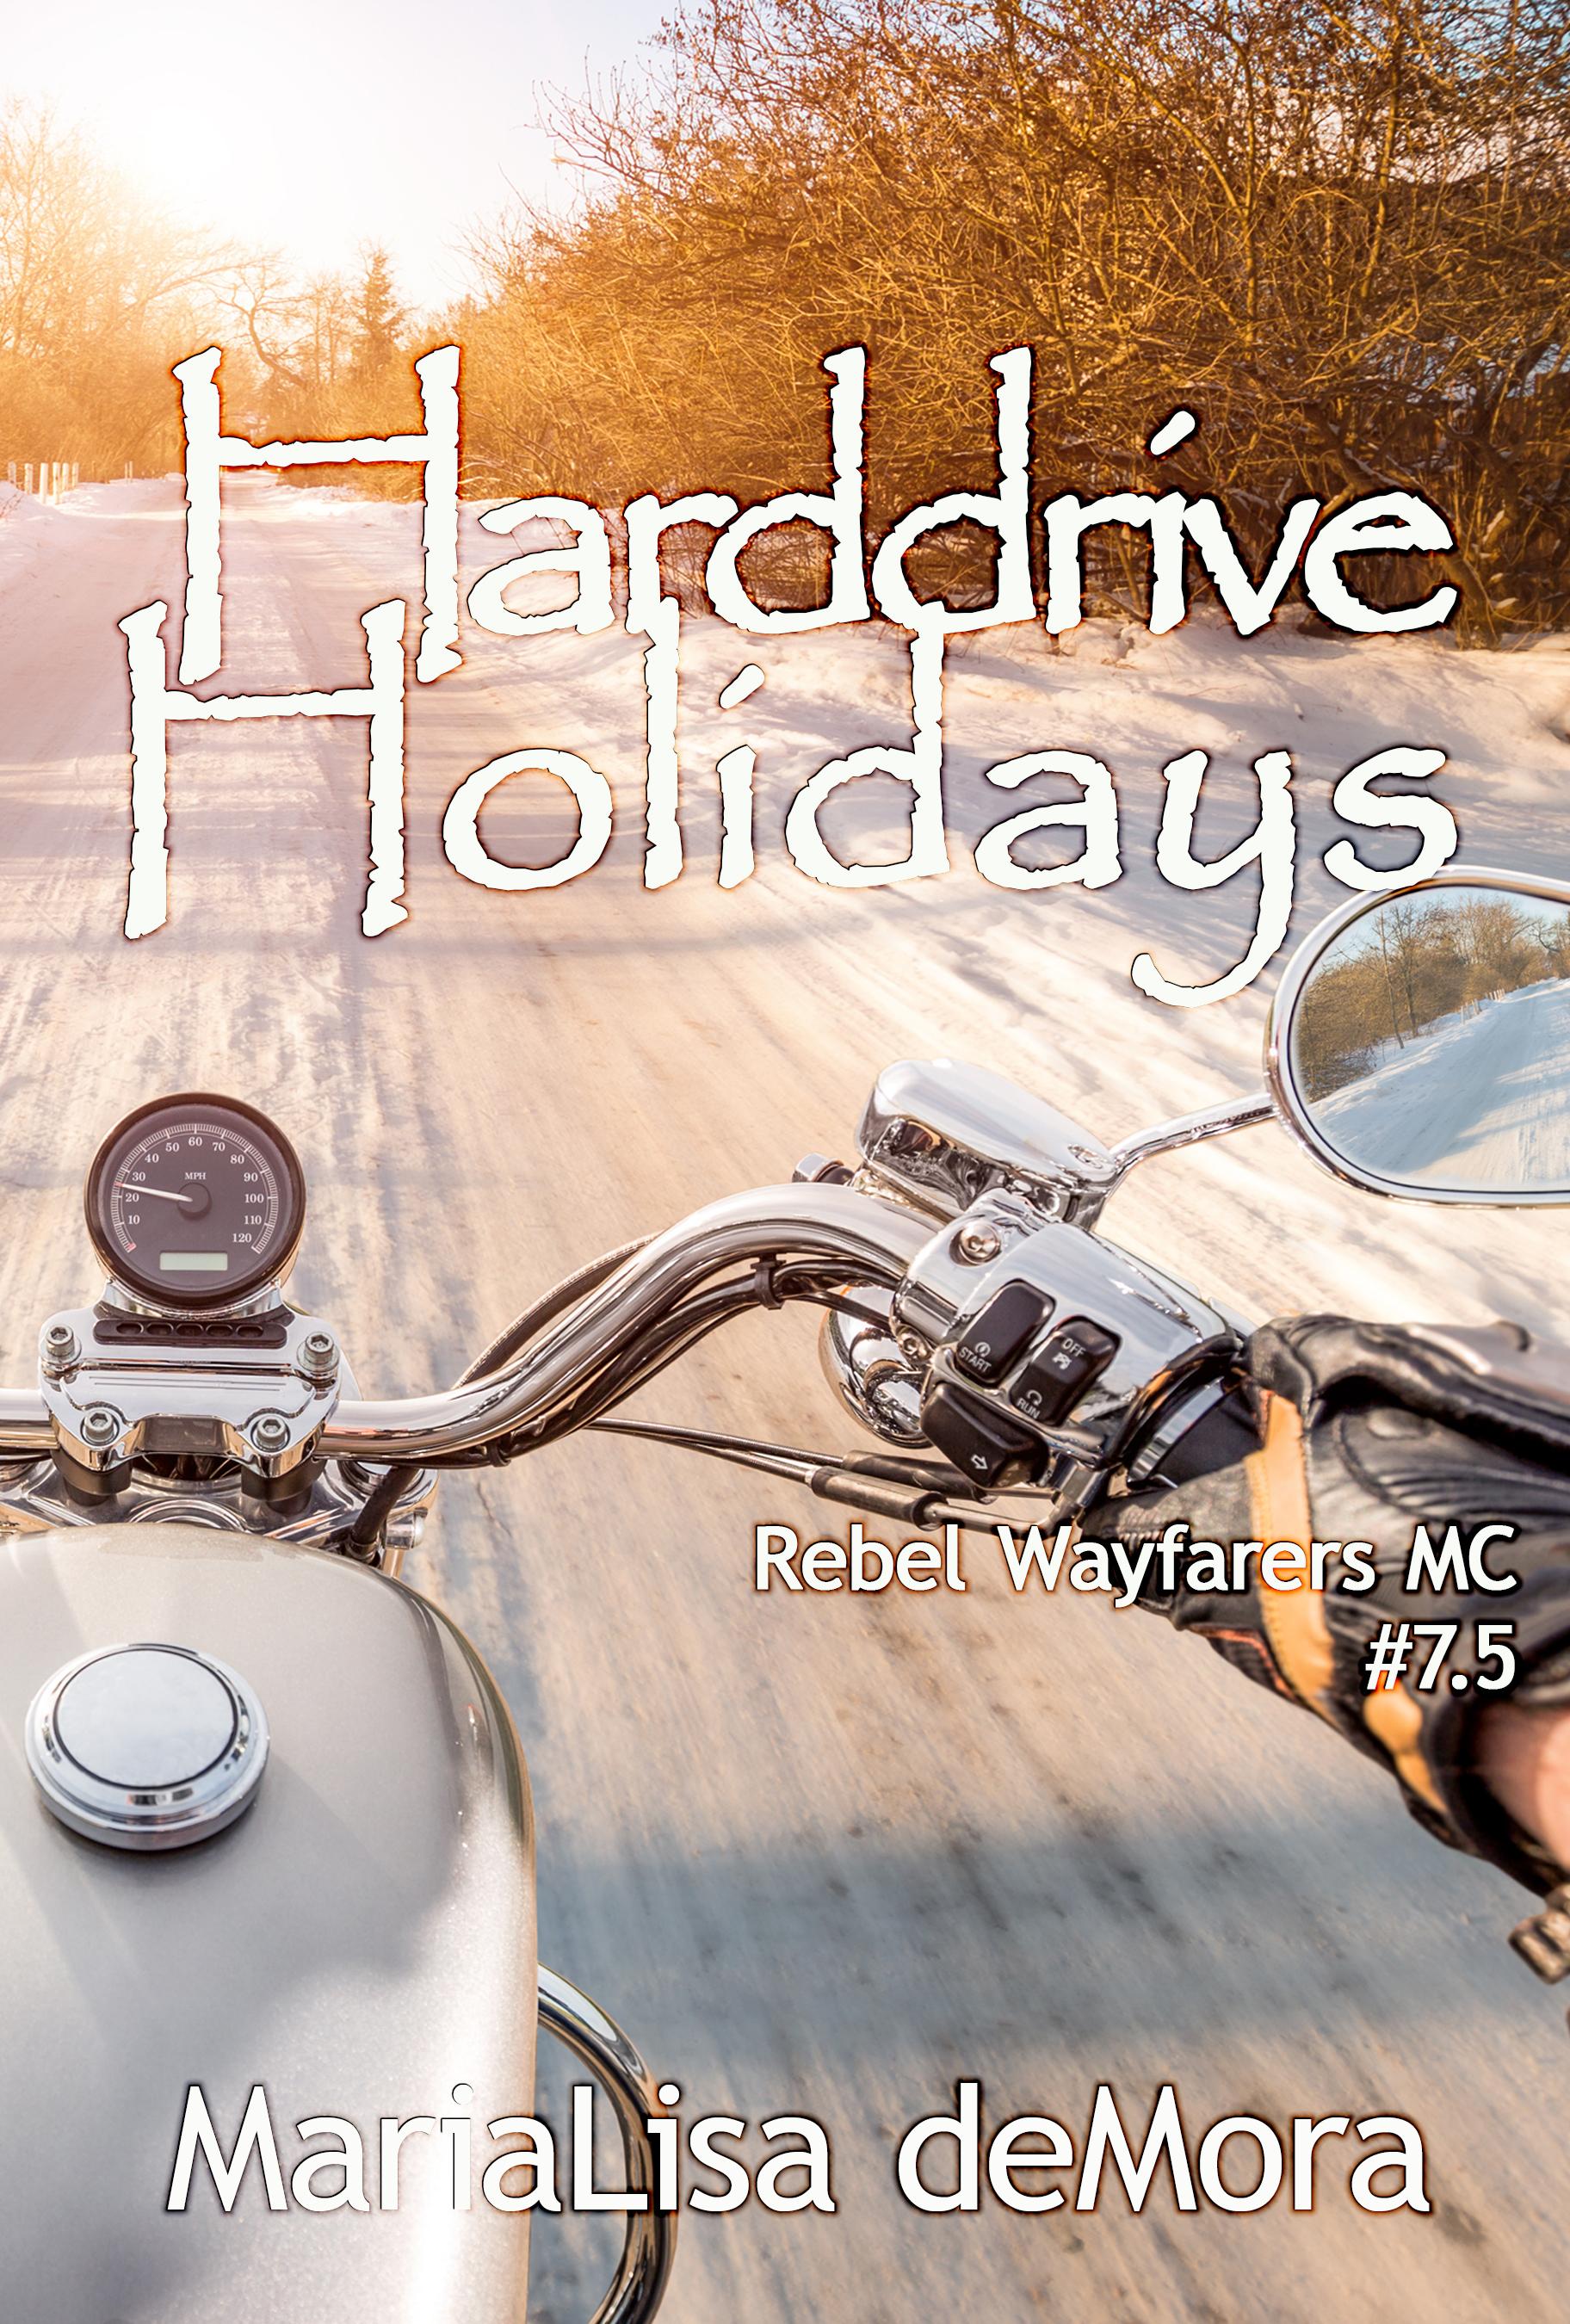 Harddrive Holidays MariaLisa deMora